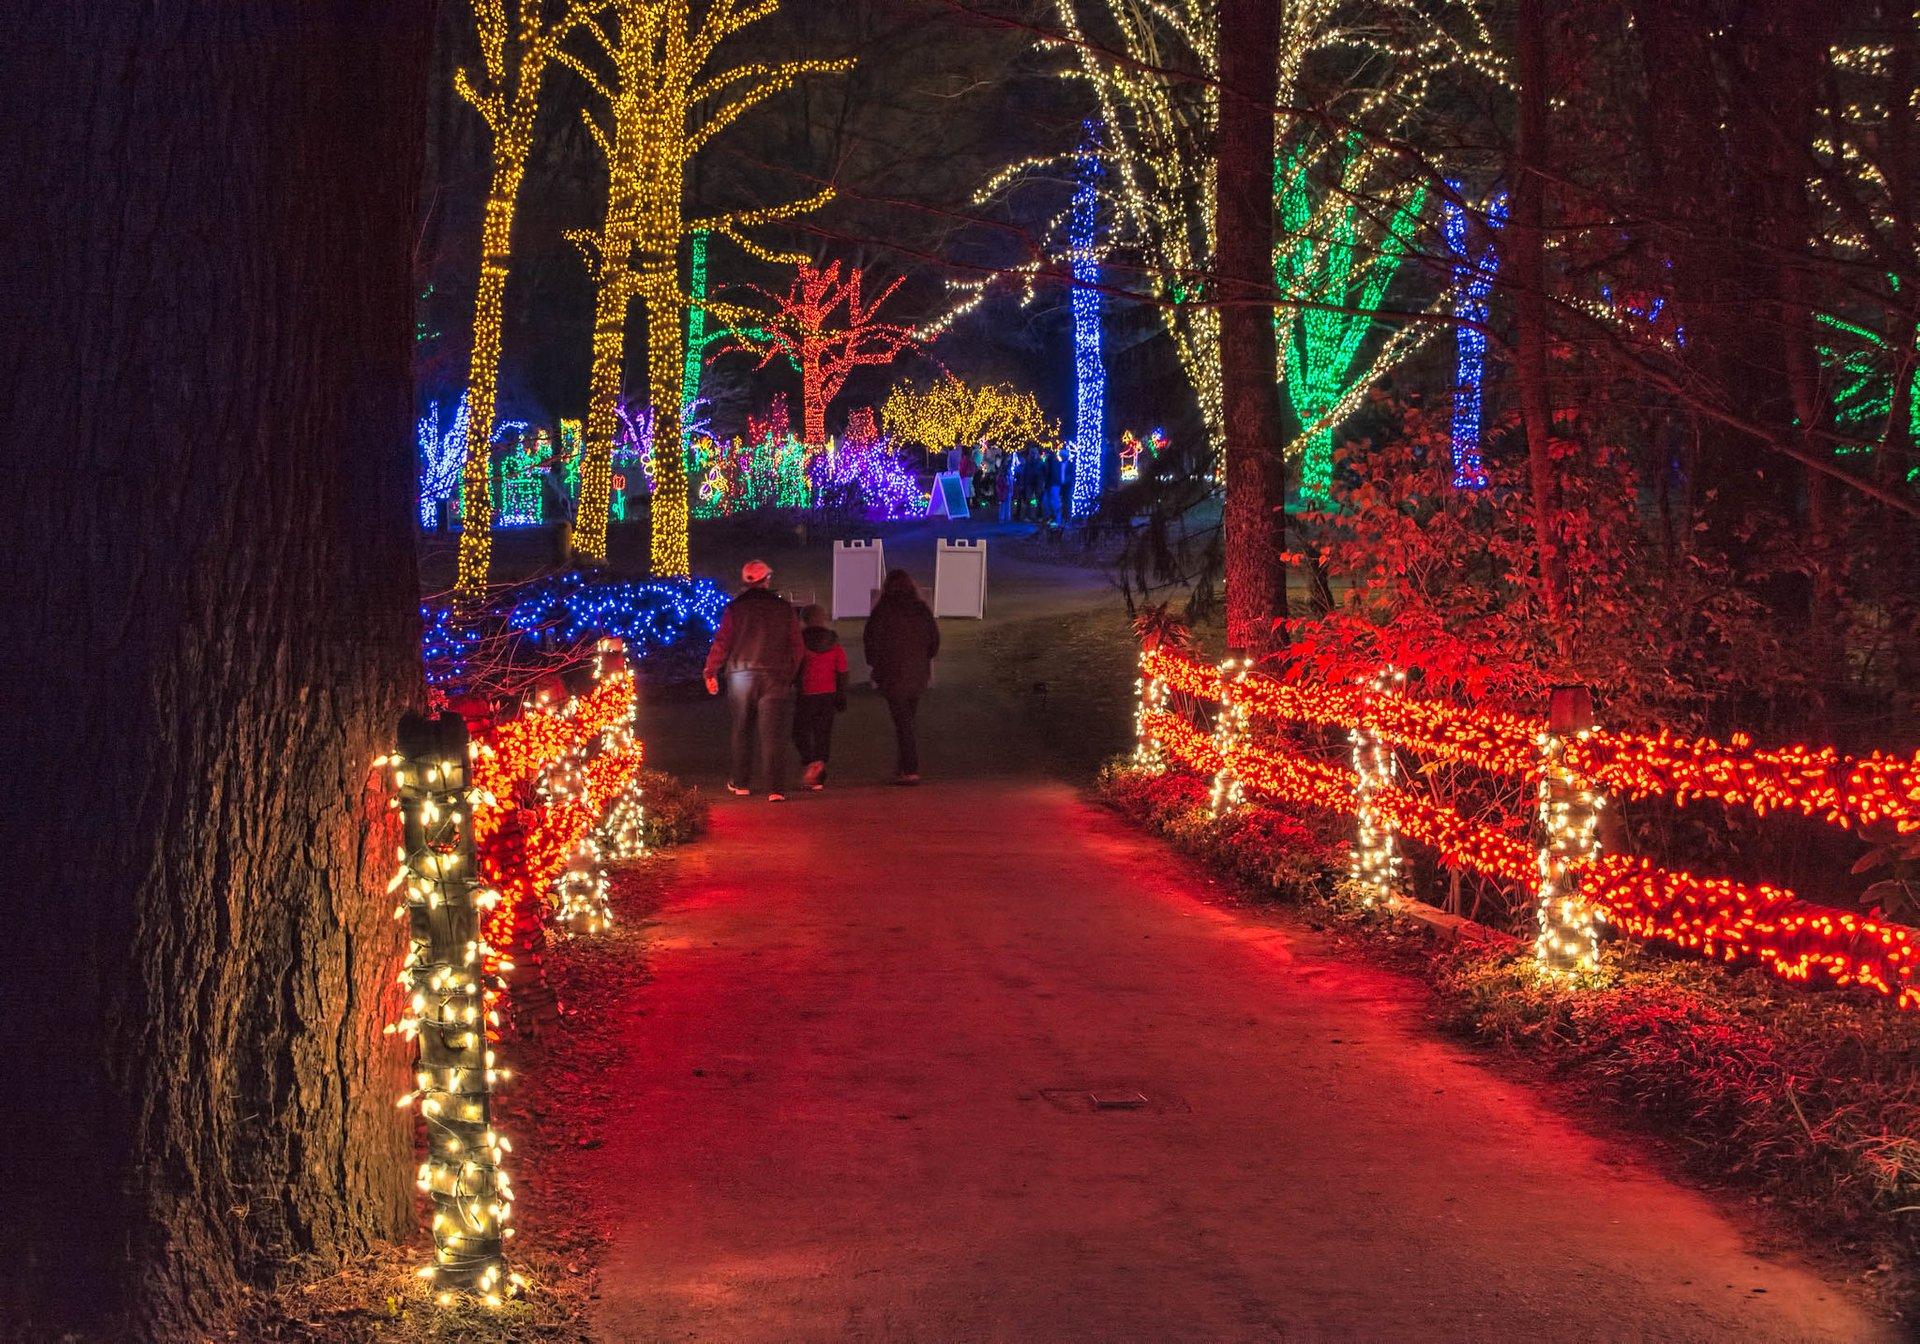 Winter Walk of Lights at Meadowlark Botanical Gardens in Virginia 2020 - Best Time